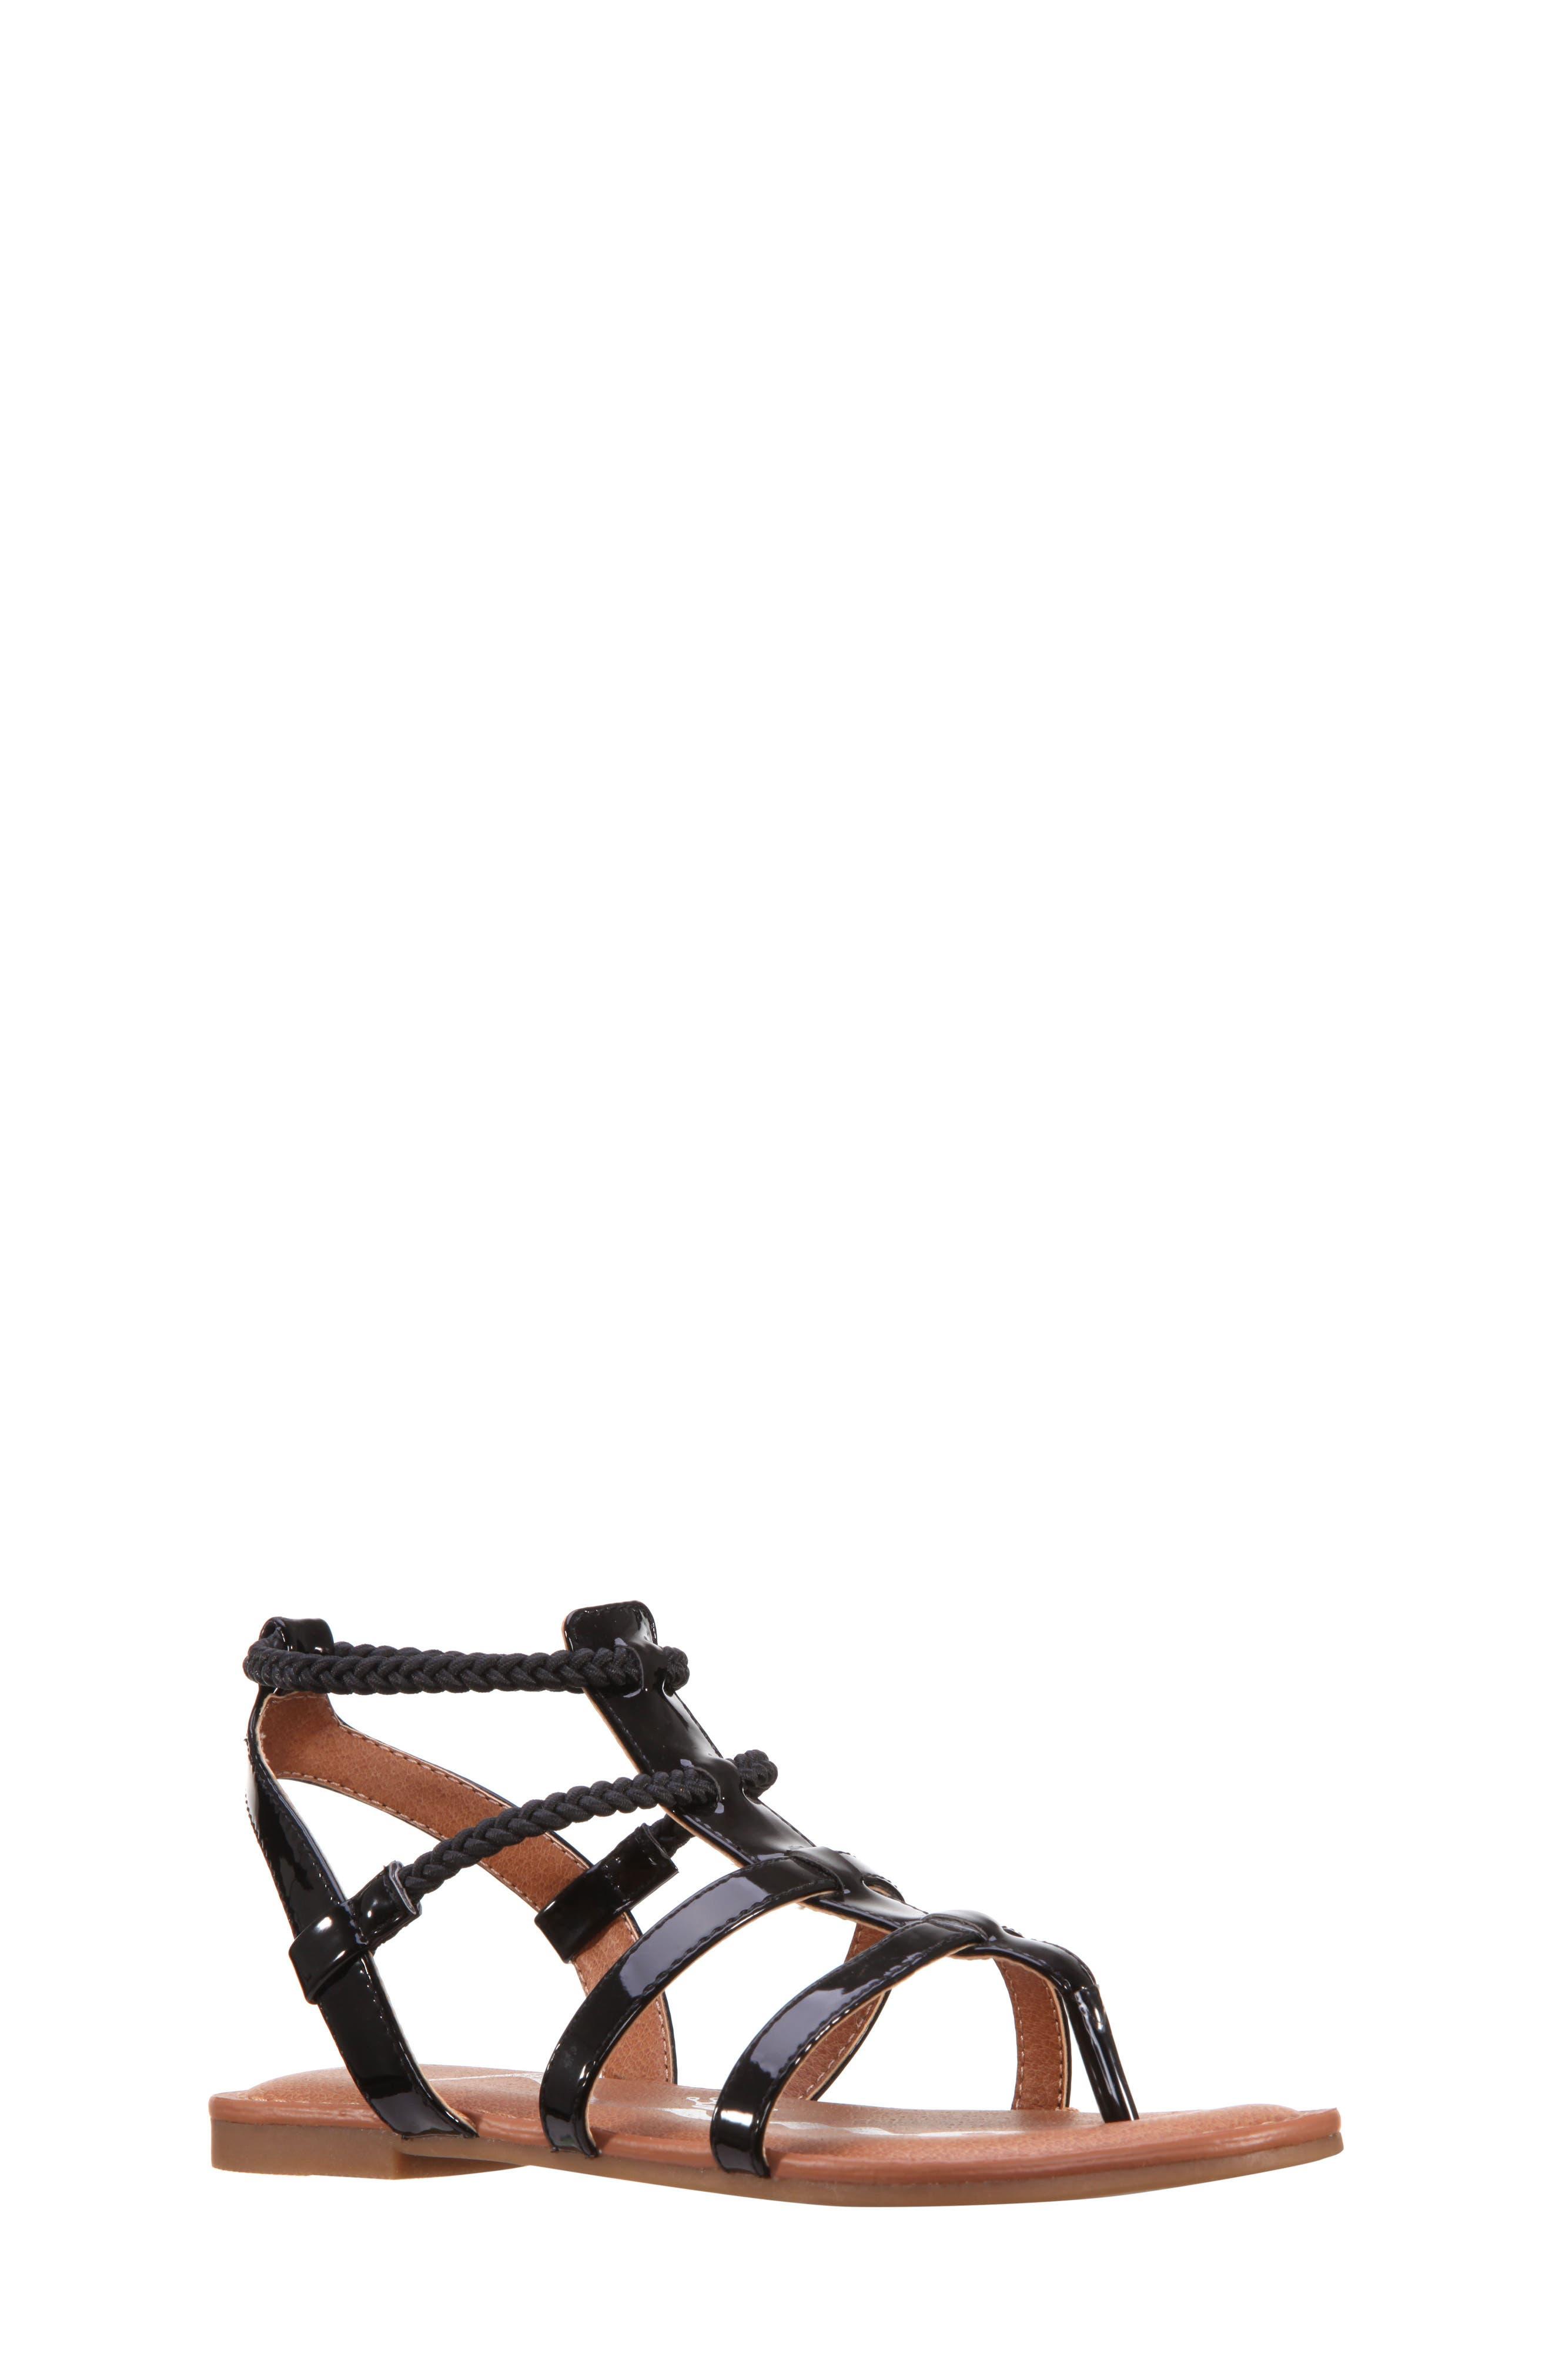 Margaree Gladiator Thong Sandal,                         Main,                         color, Black Patent